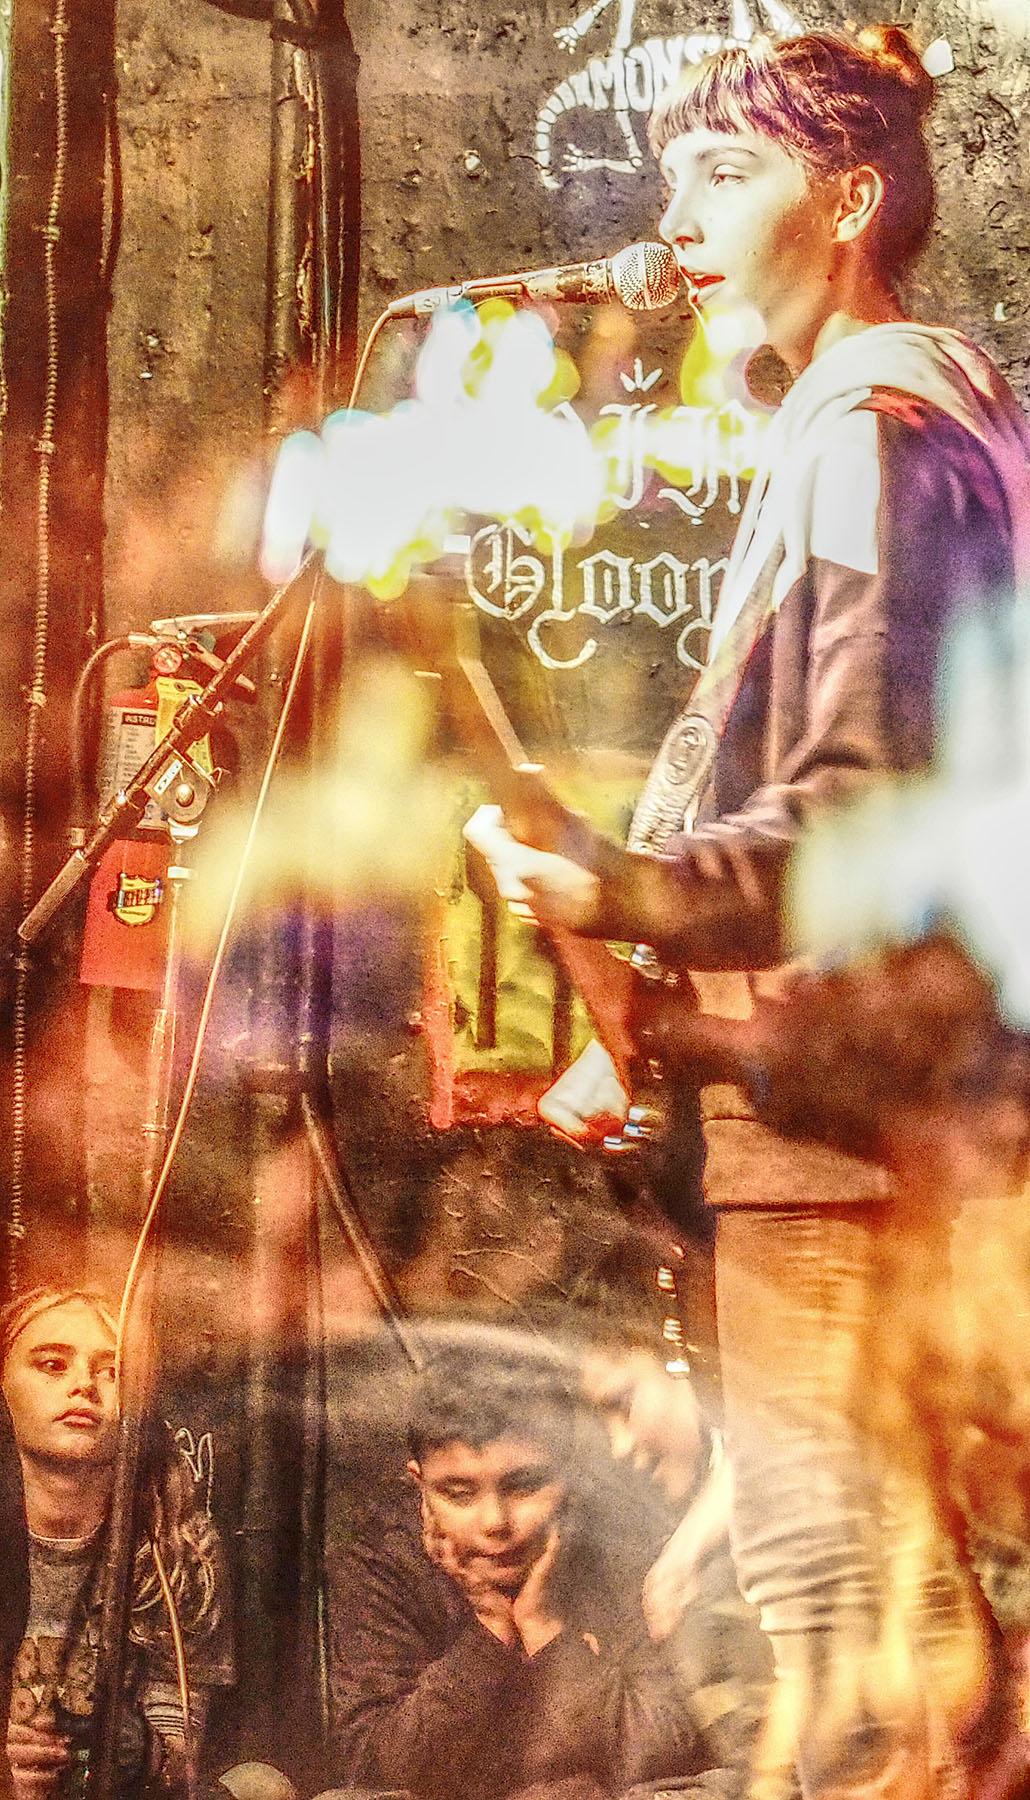 Amanda_Rittenhouse_Music in Motion_Am I boring you_4.jpg